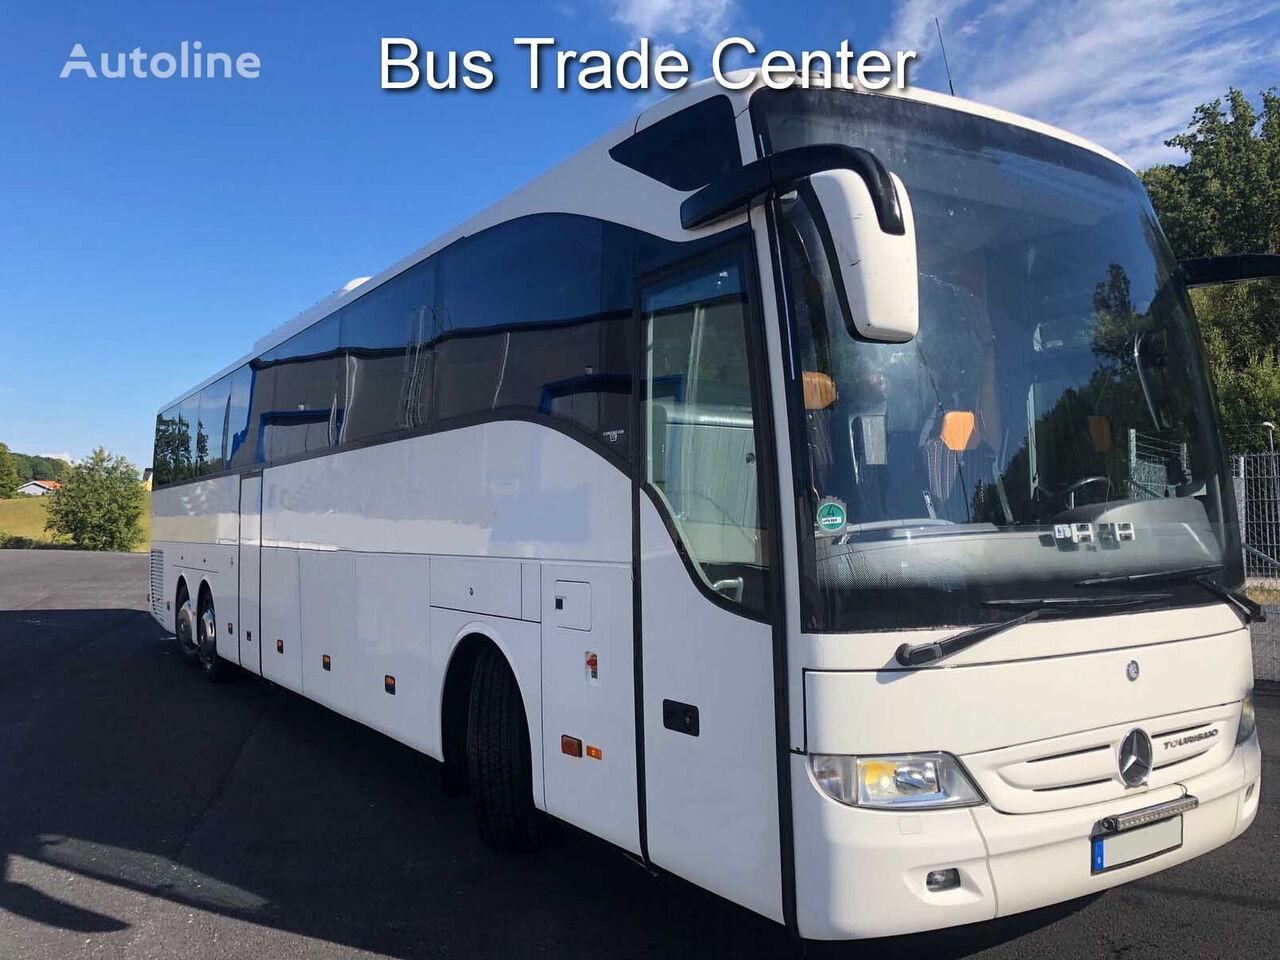 MERCEDES-BENZ TOURISMO 17 RHD-L interurban bus